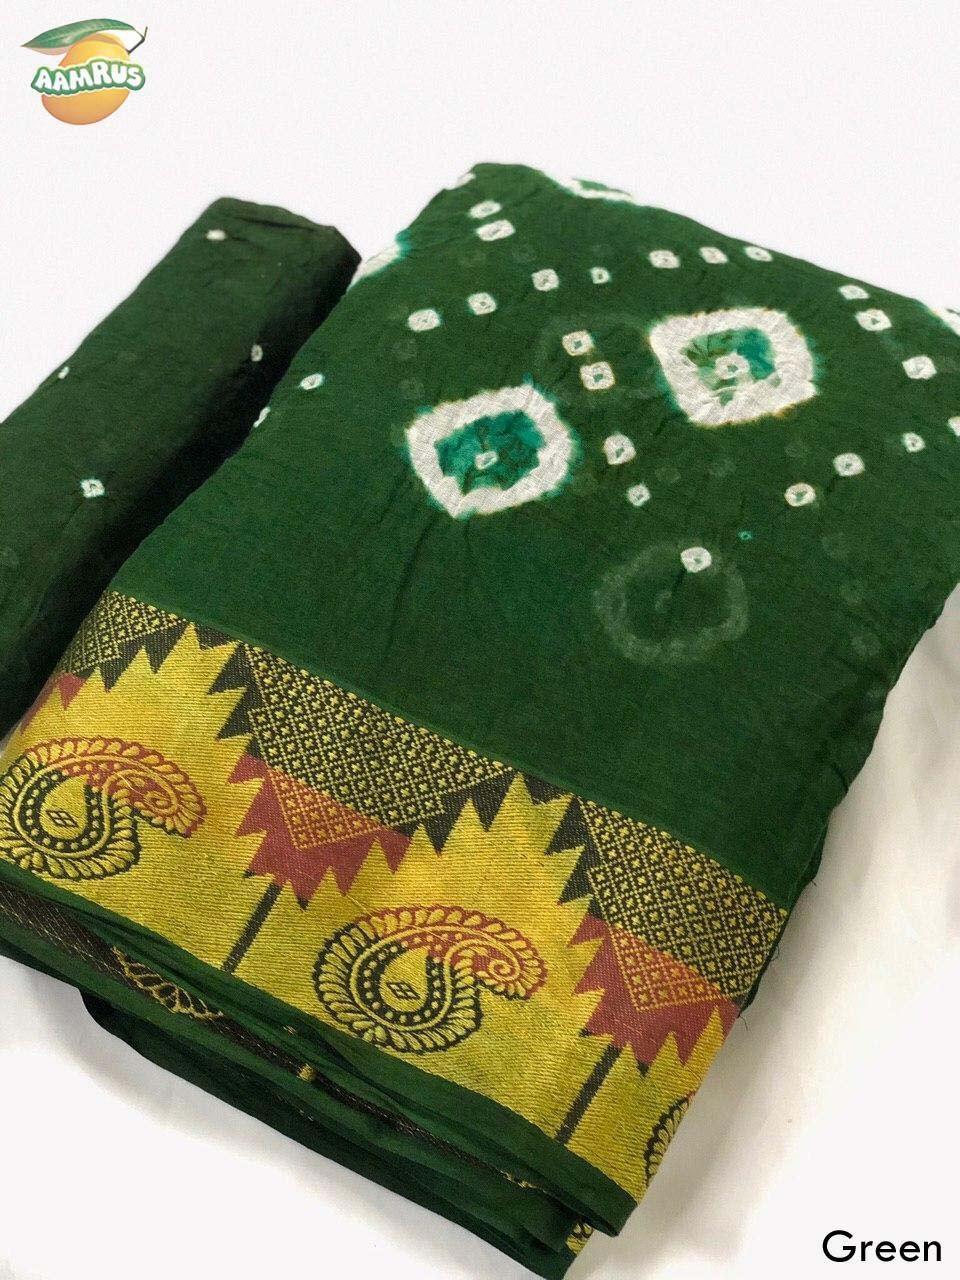 Ssm-Aamrus-Pure-Cotton-Saree-6